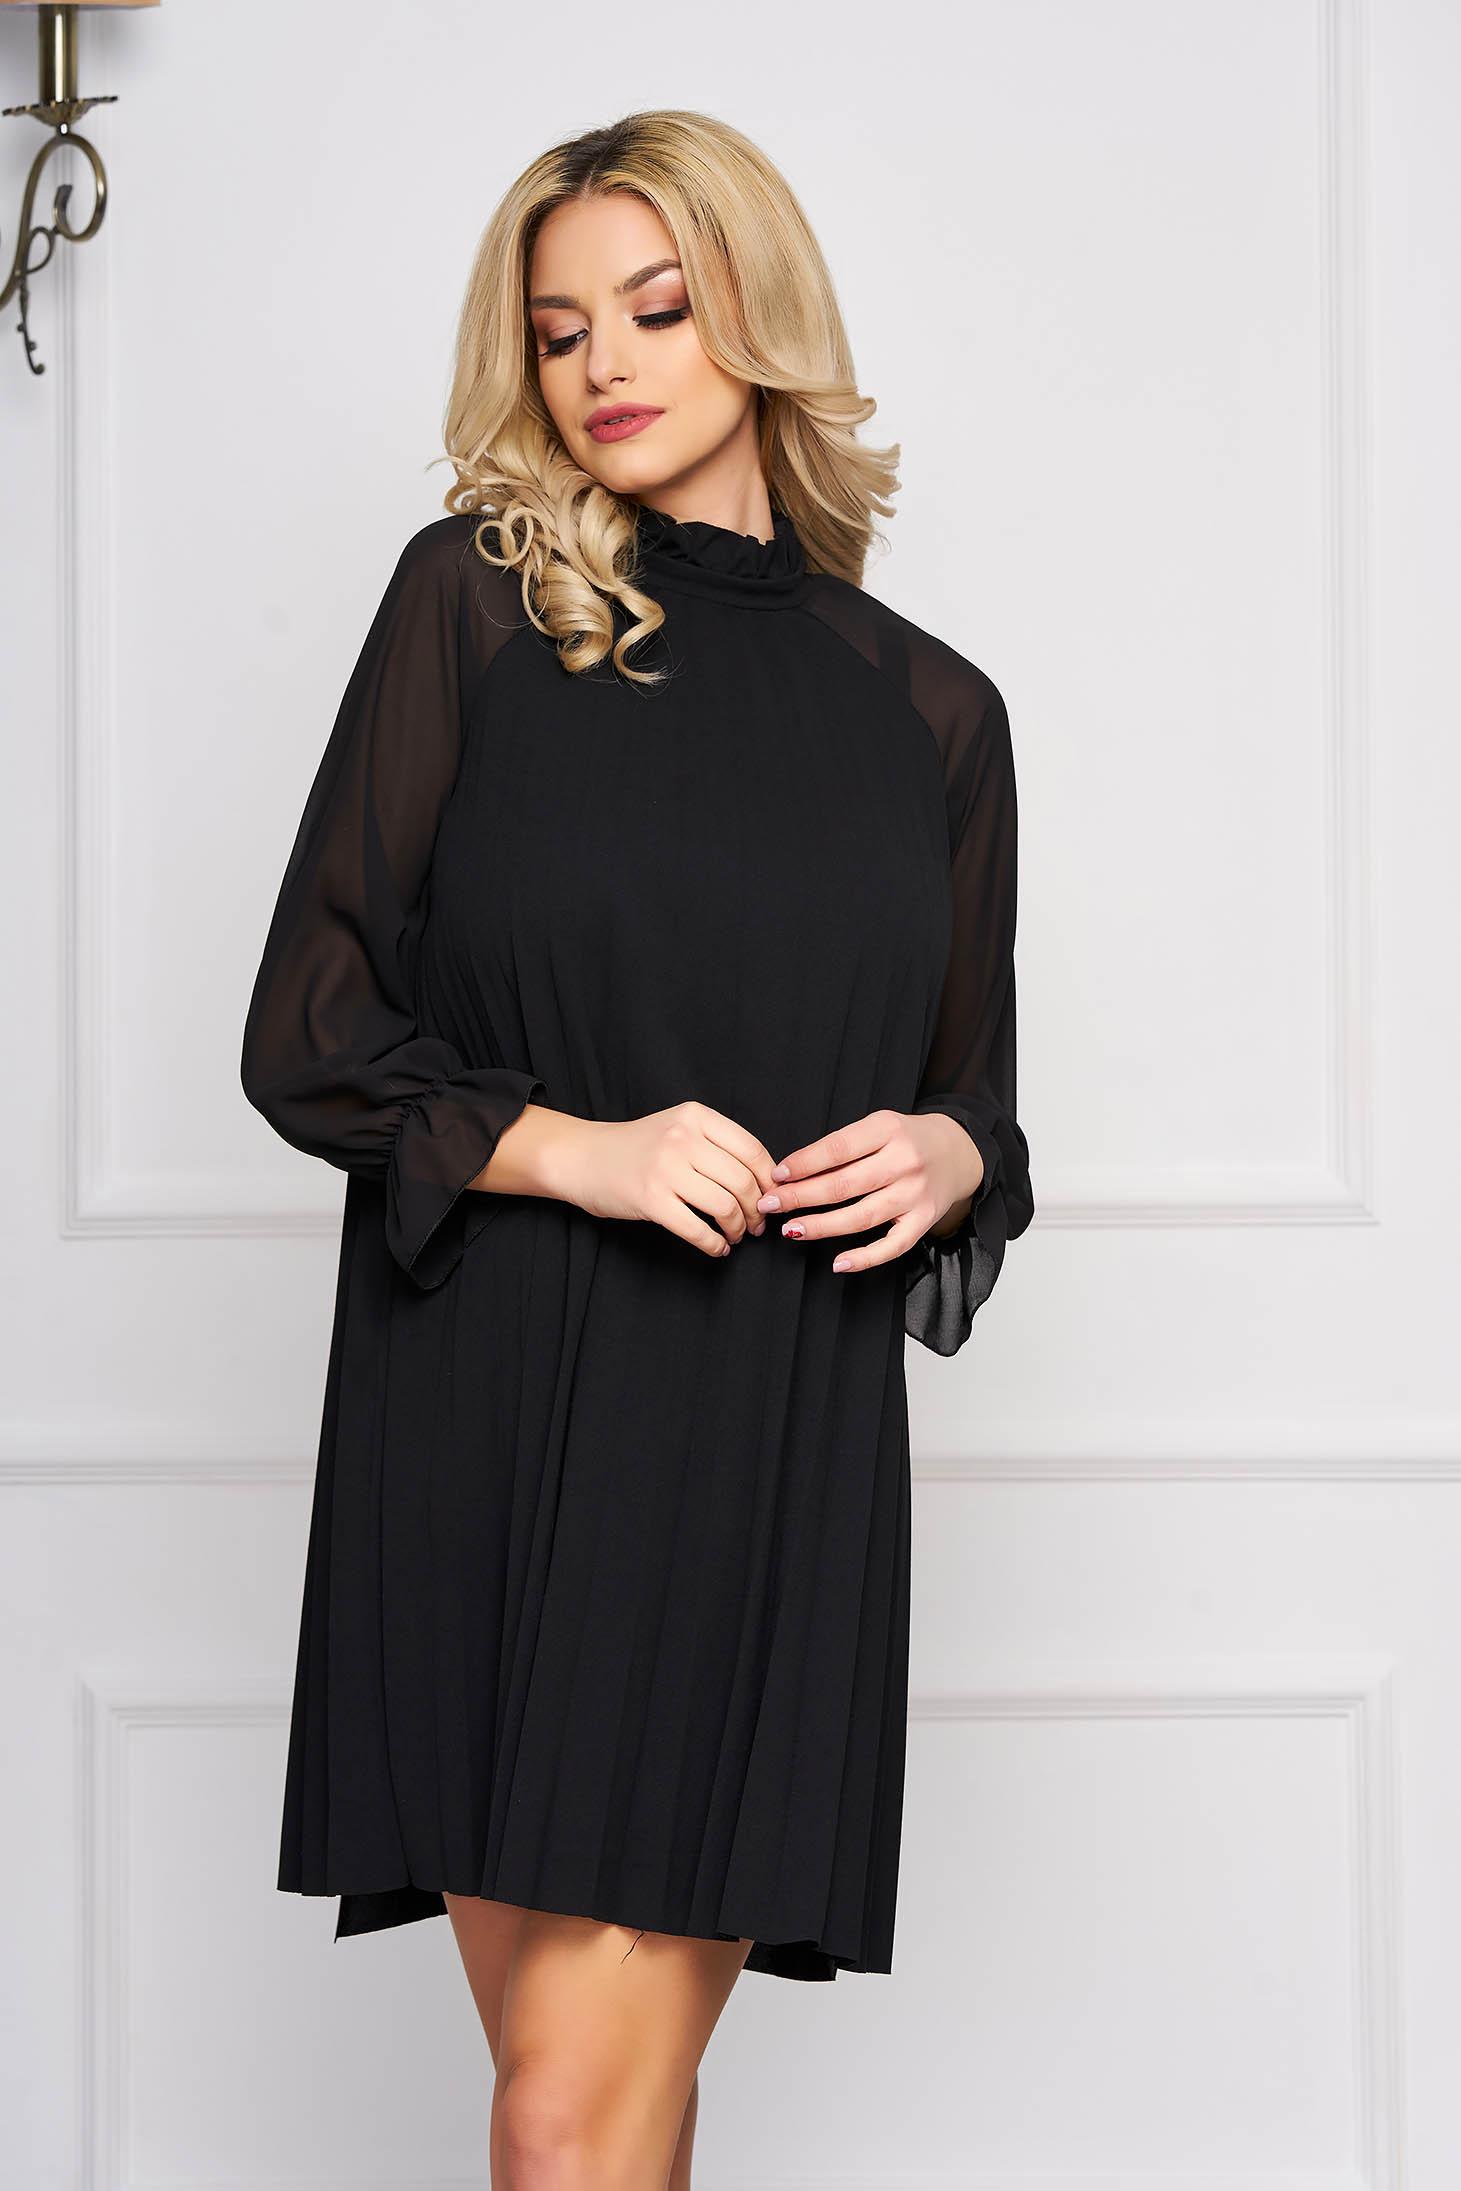 Black dress elegant short cut from veil fabric a-line long sleeved